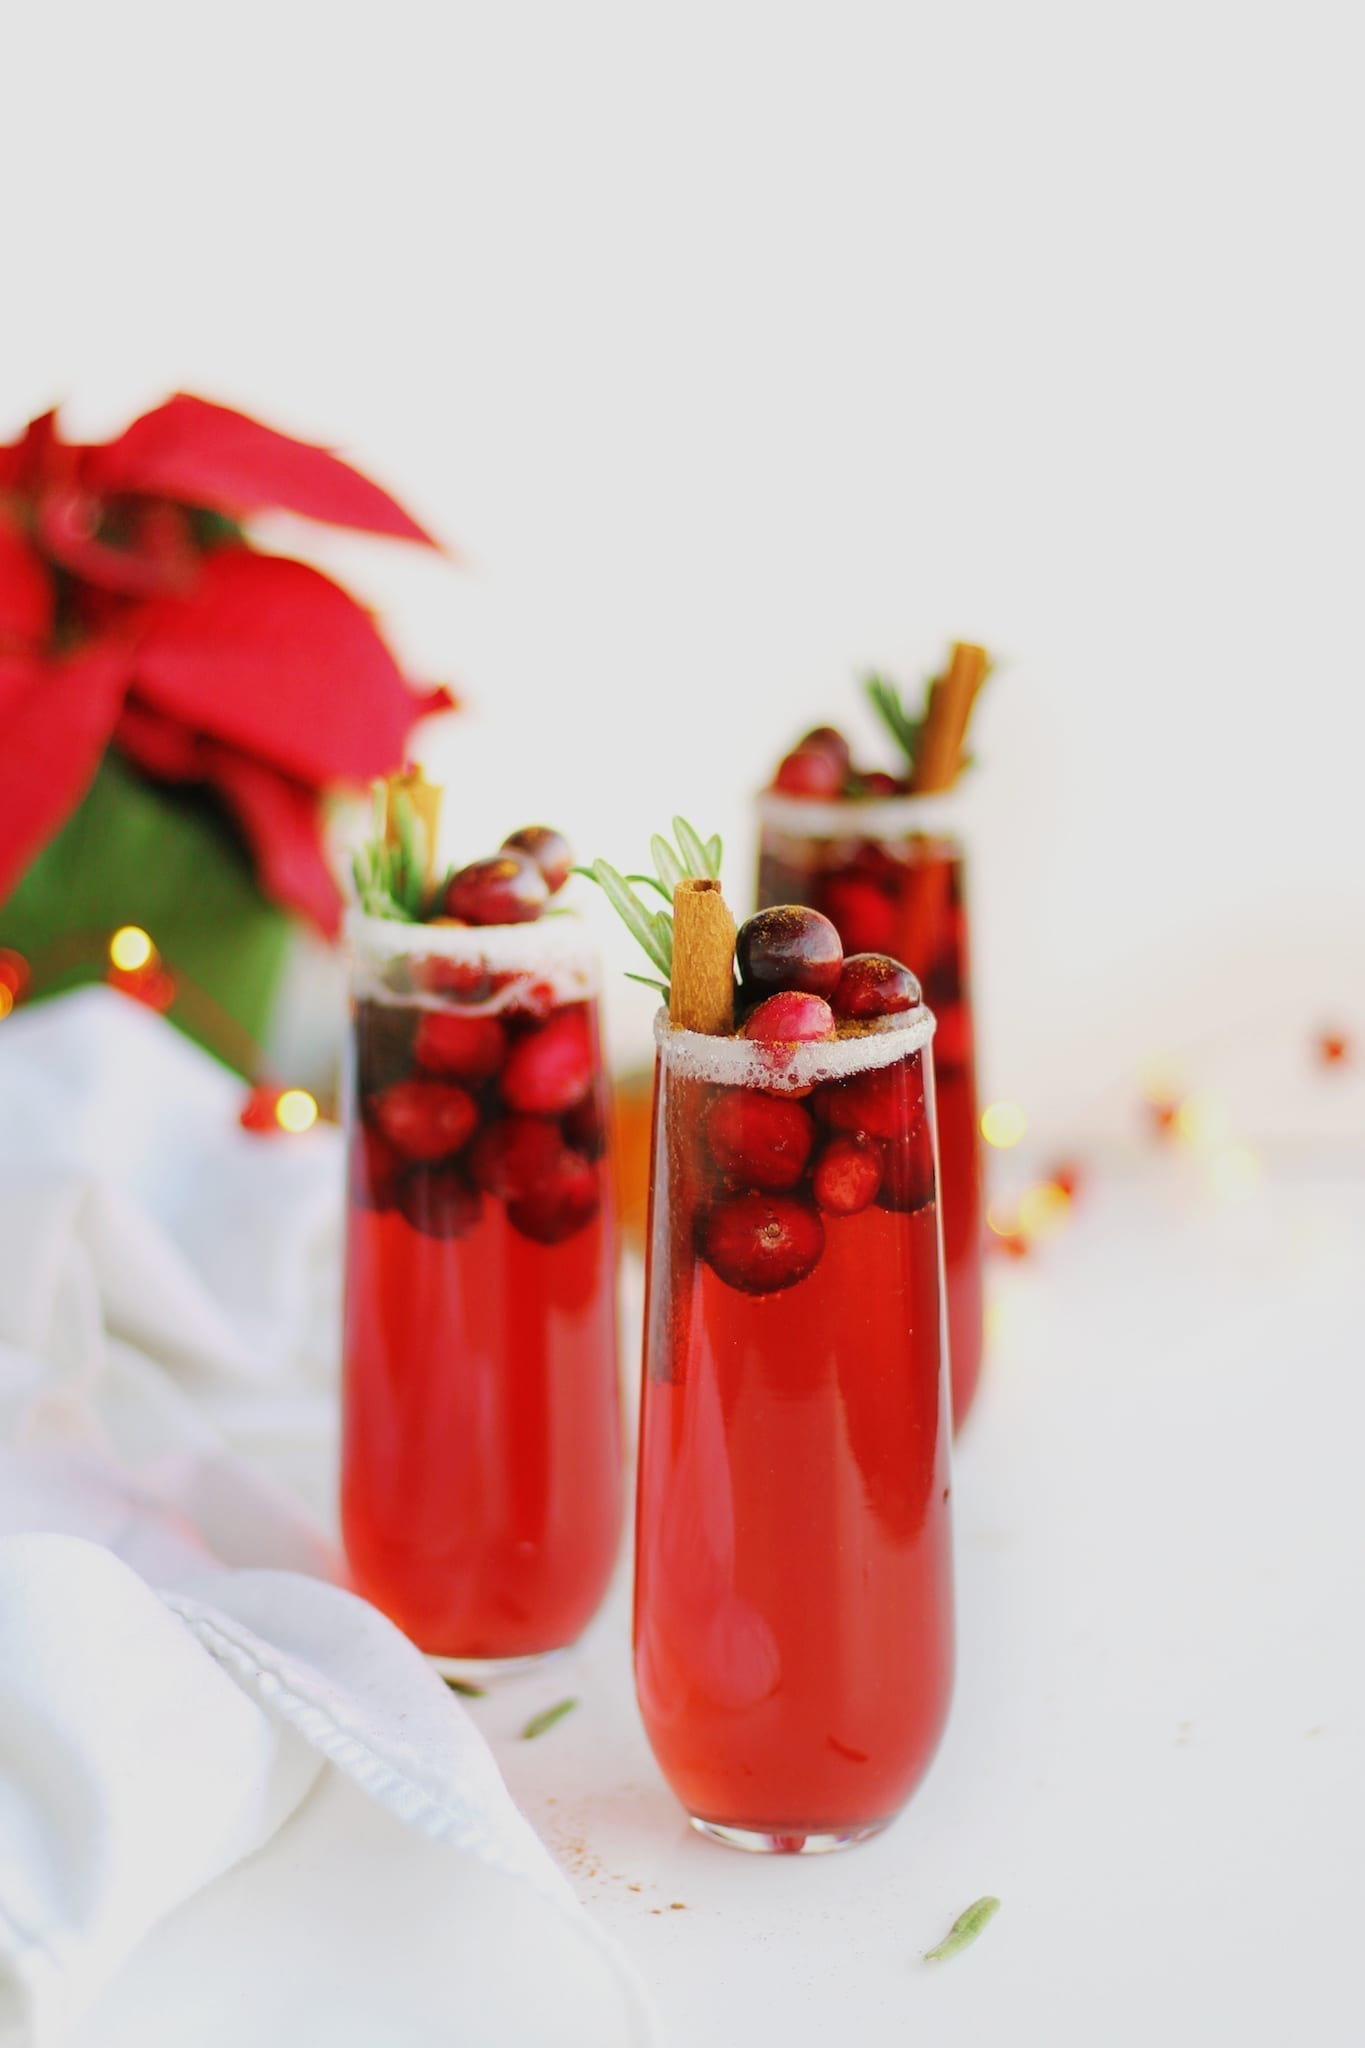 Vegan holiday recipes, orange cranberry mimosa mocktail